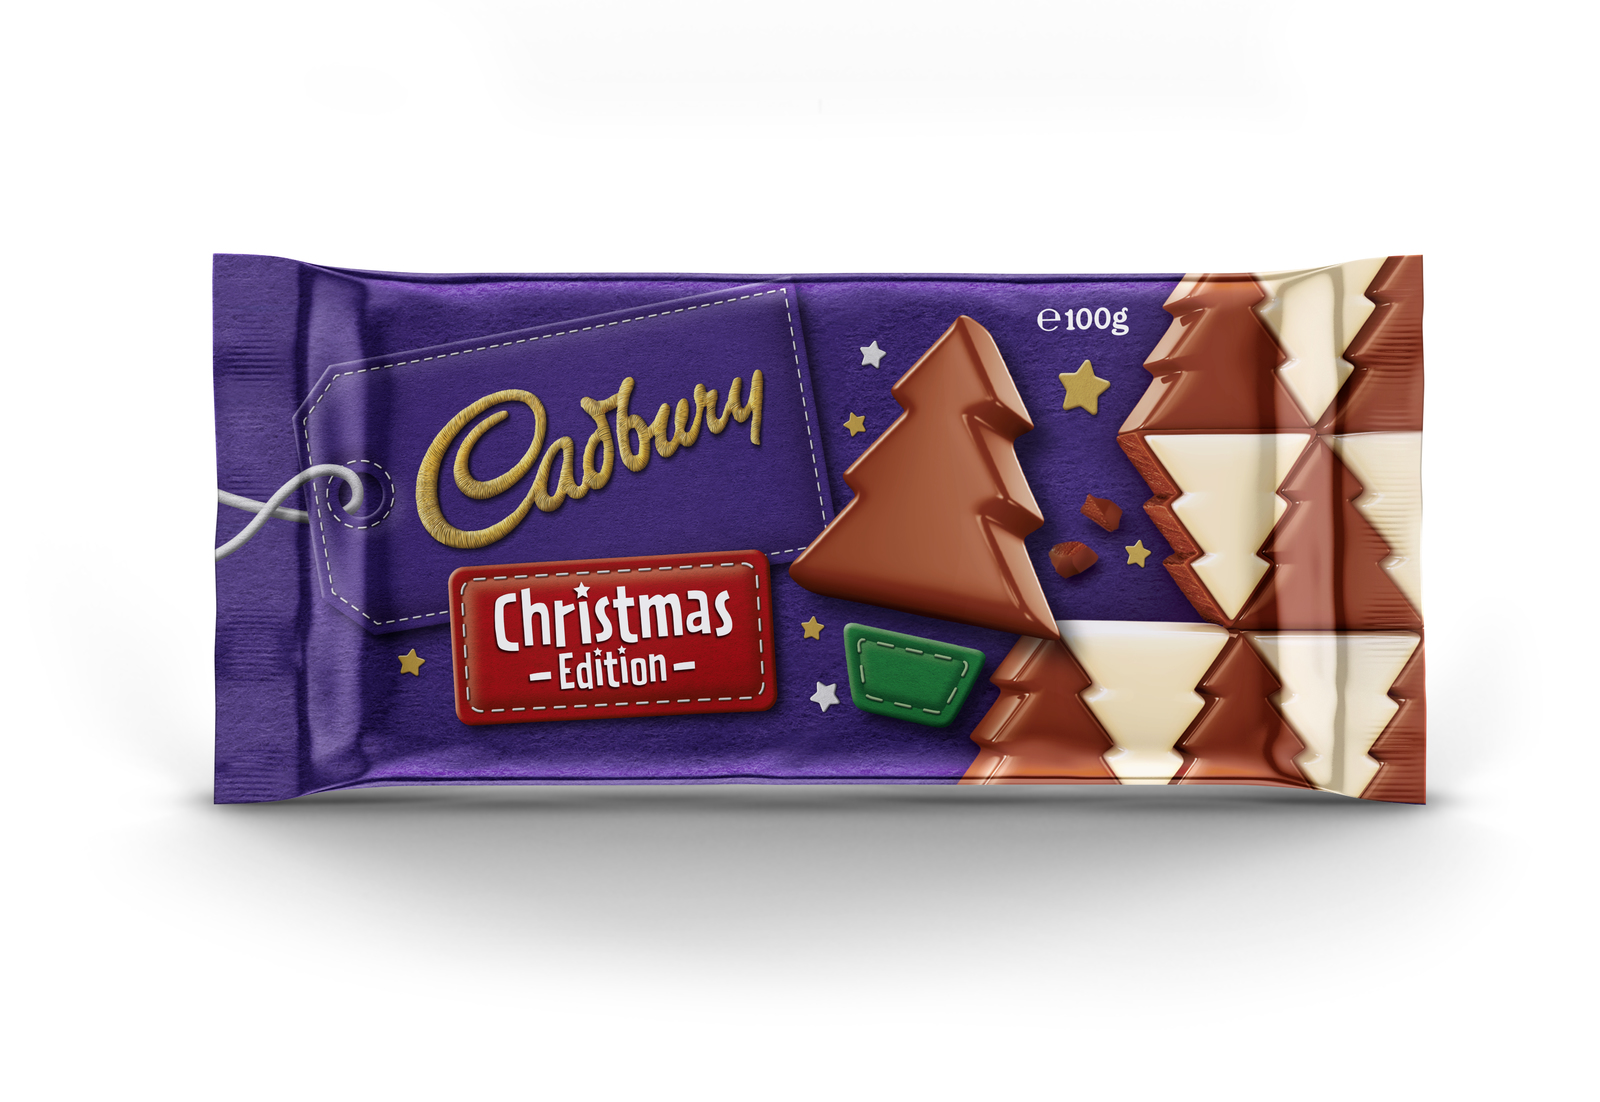 Cadbury Christmas Block (100g) image